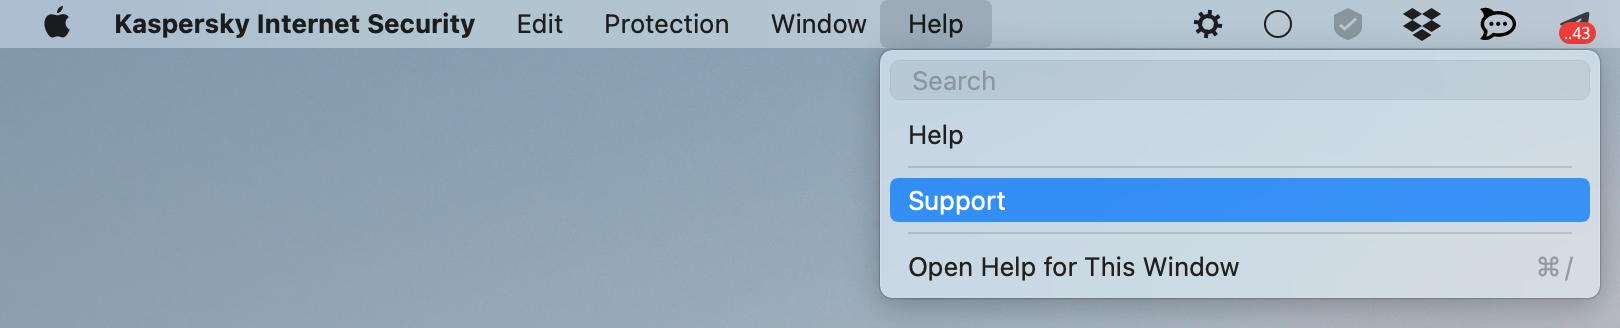 Kaspersky menu showing the Support option